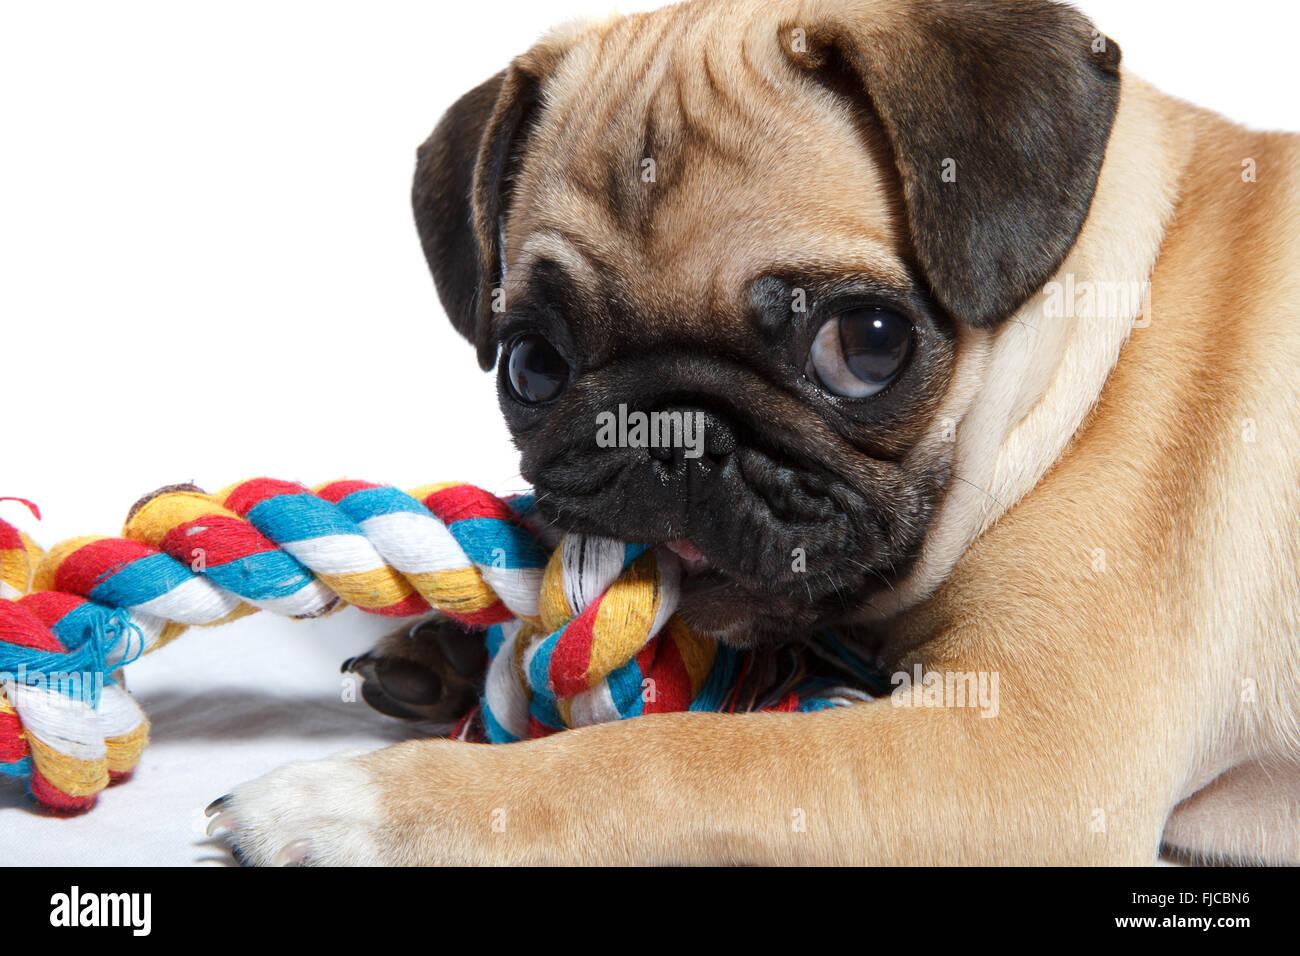 Pug biting toy - Stock Image